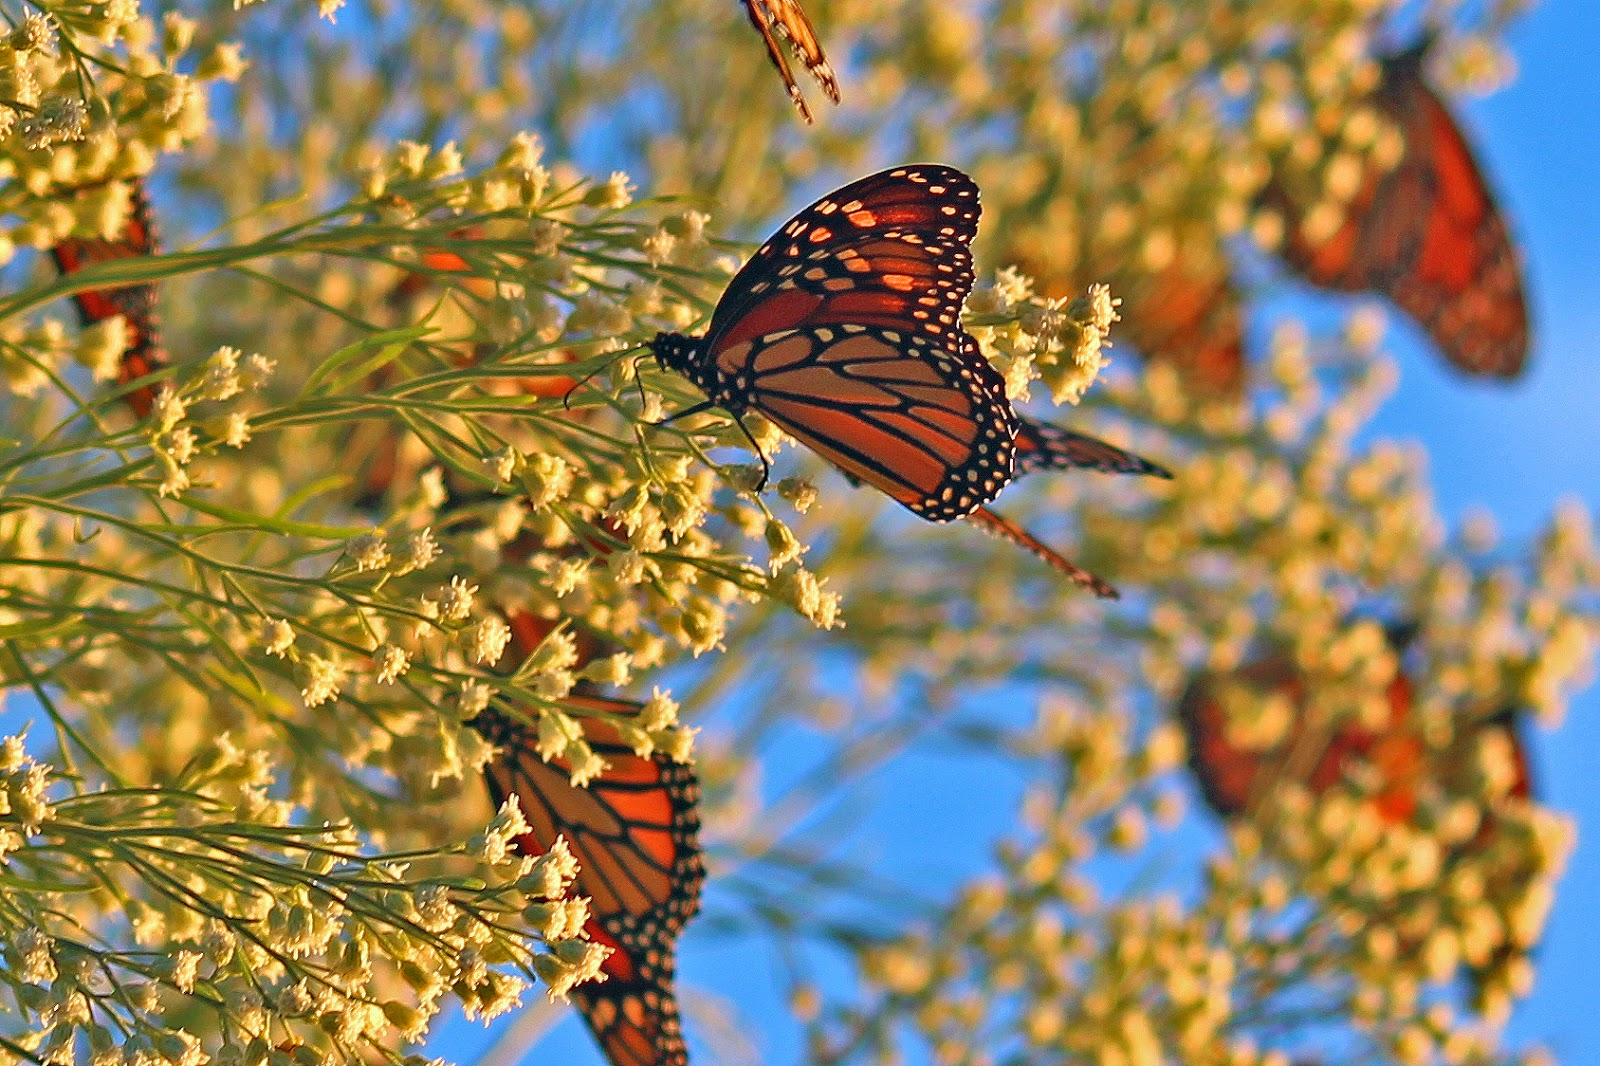 Dallas Trinity Trails Monarch Butterfly Migration